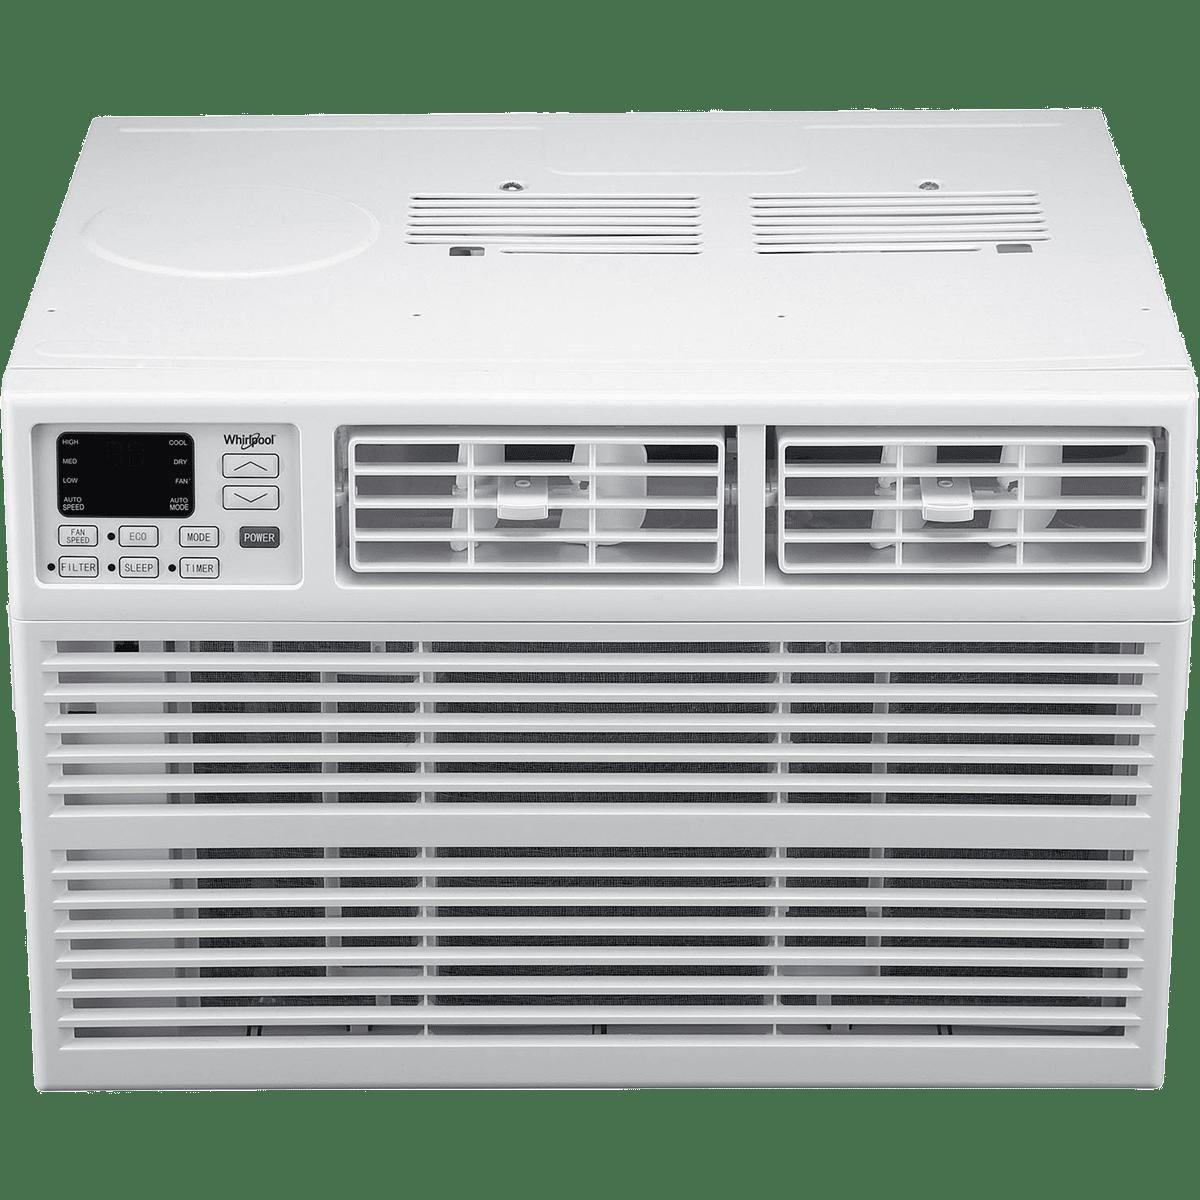 Whirlpool 10,000 BTU Window Air Conditioner w| Electronic Controls (WHAW101BW)